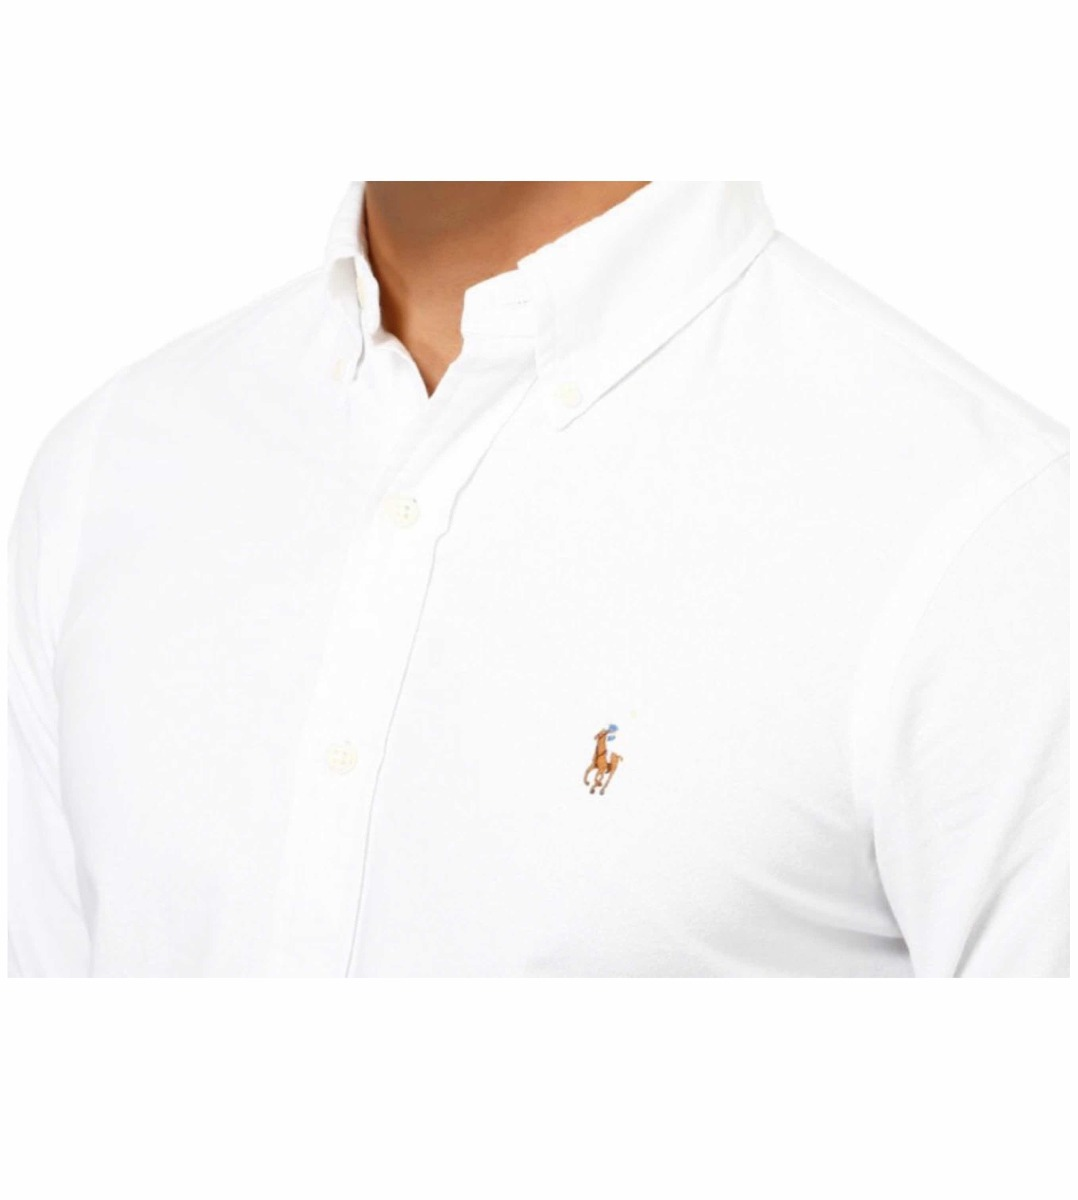 camisa polo ralph lauren. Cargando zoom. f8d687ffd304e